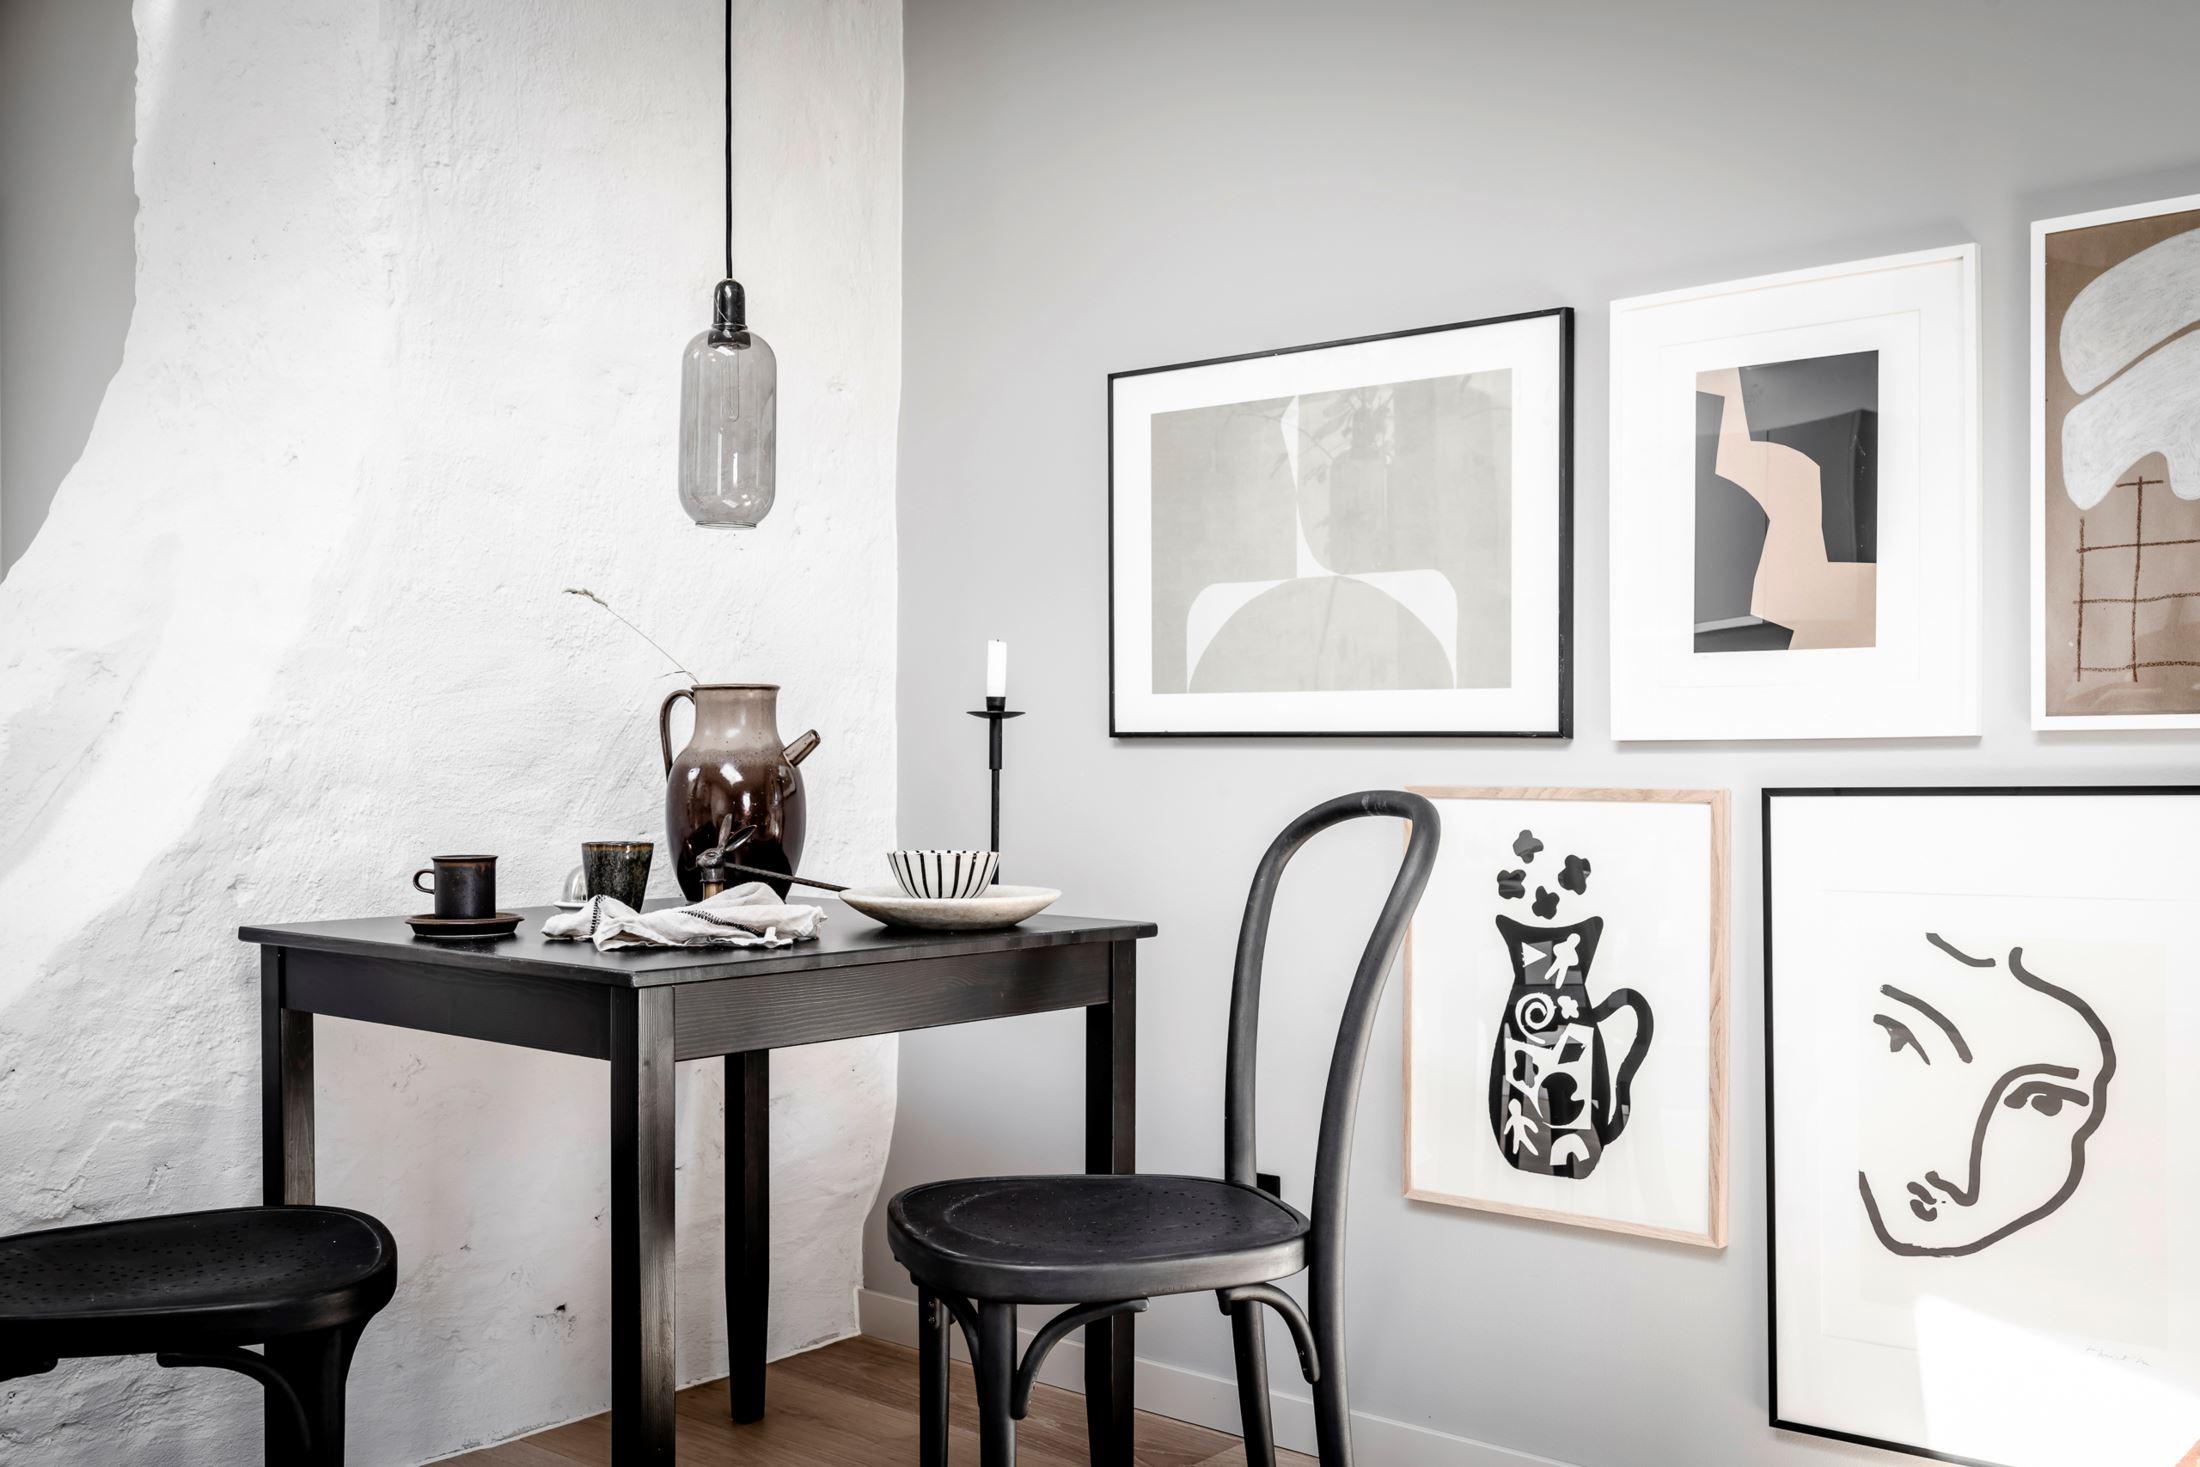 Plan deschis și decor nordic într o garsonieră la mansardă 35 m² 19